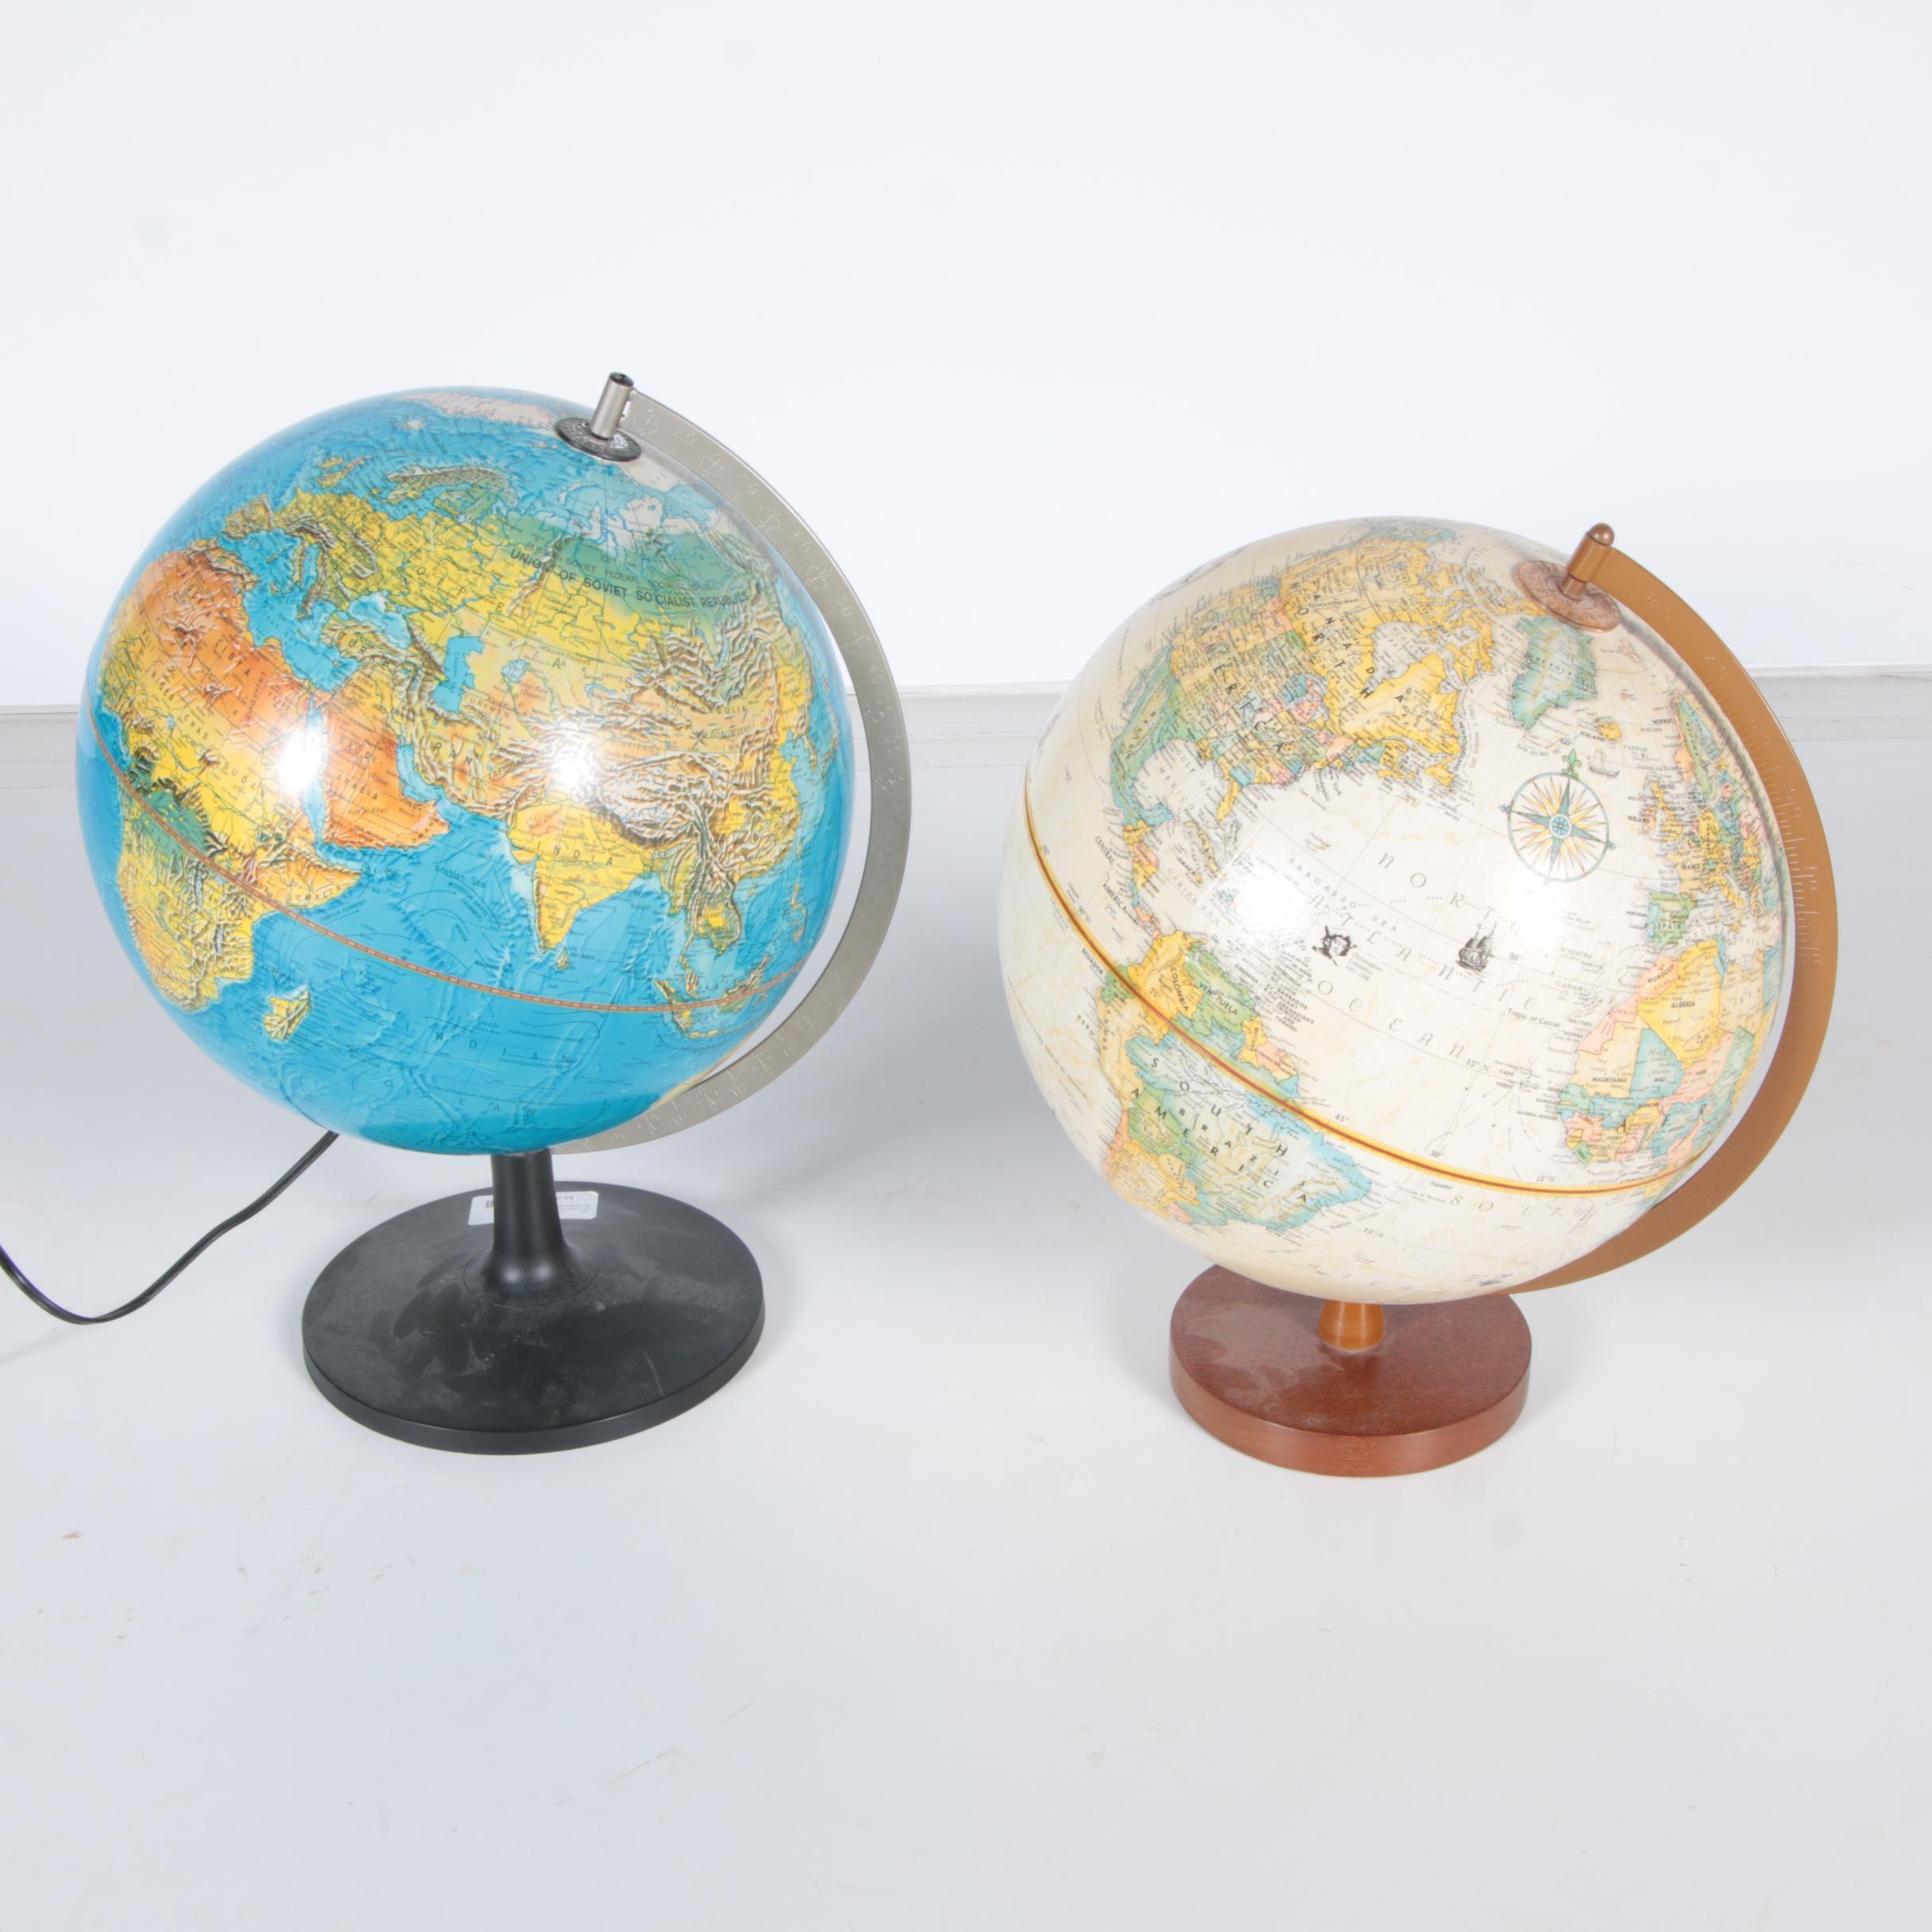 Pair of Desktop Globes